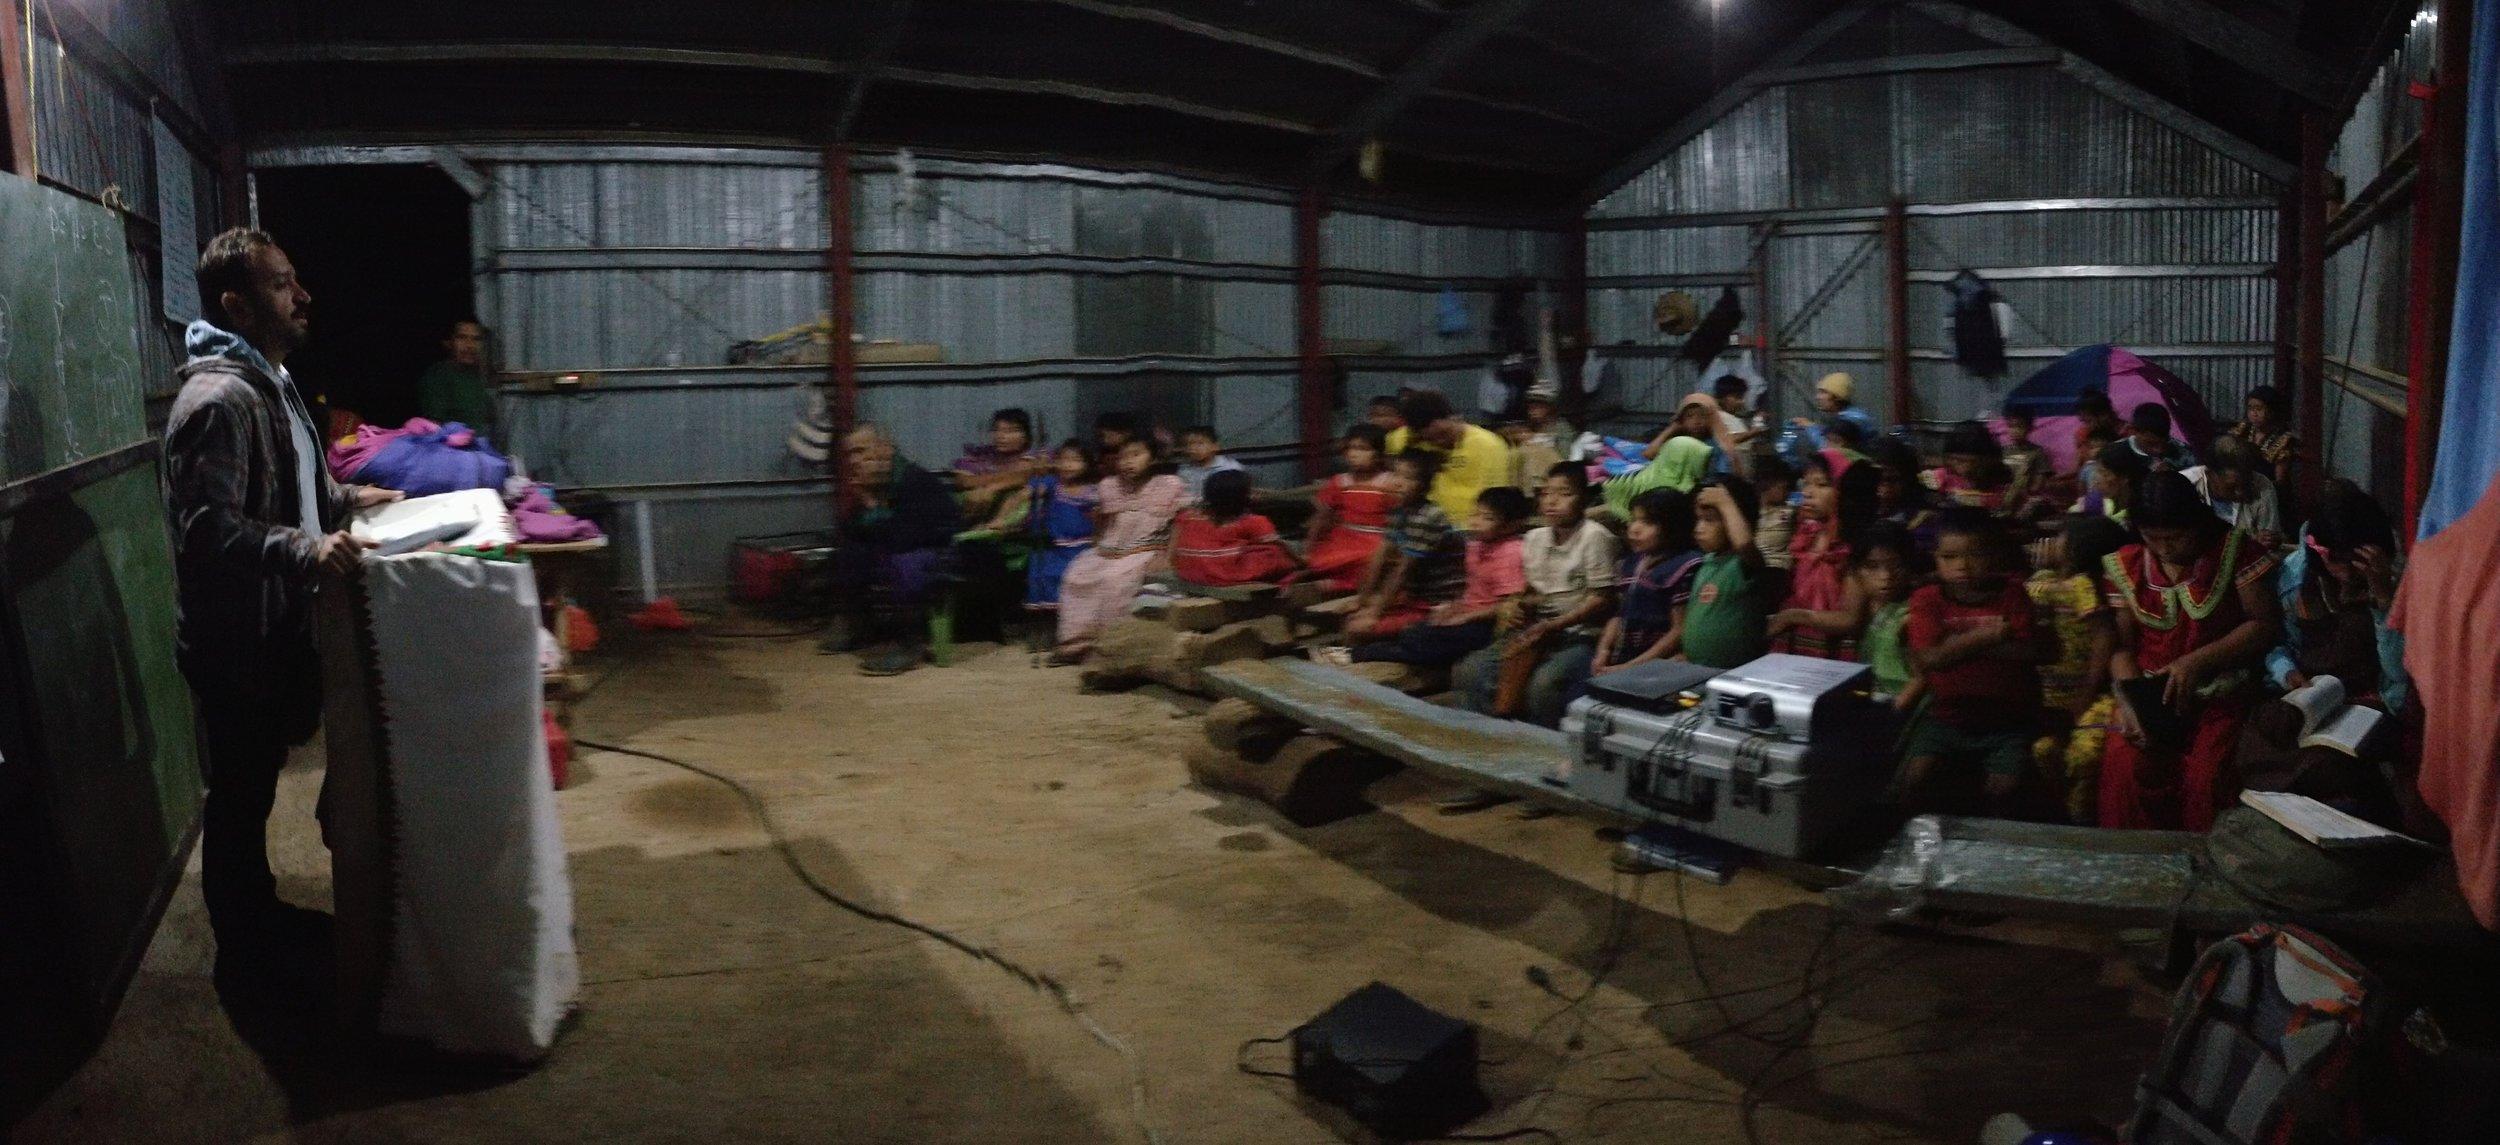 Meetings for teaching the church.